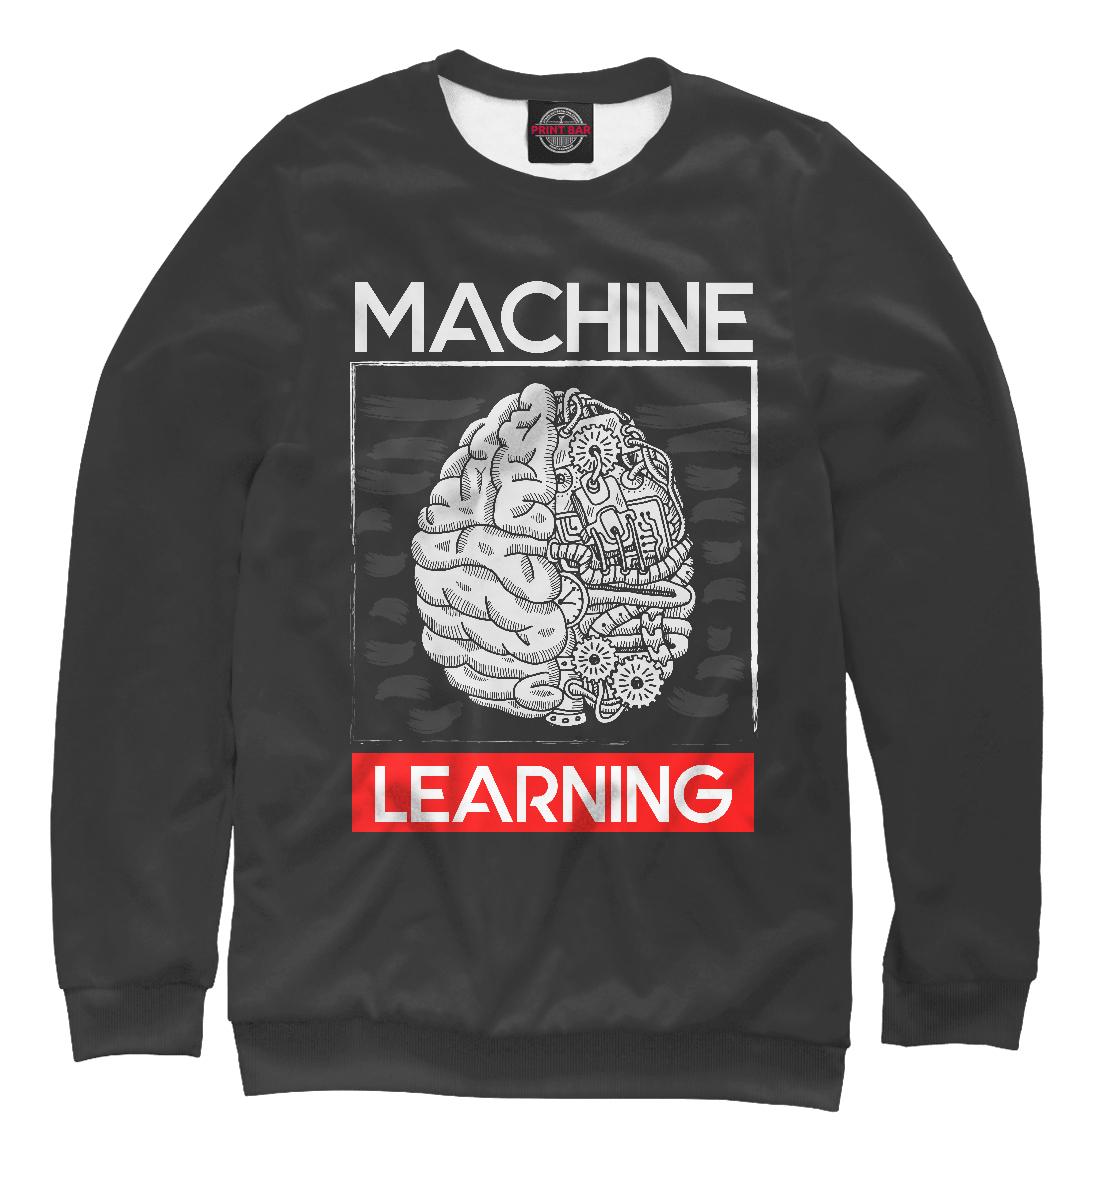 Фото - Machine Learning Brain paolo perrotta machine learning für softwareentwickler